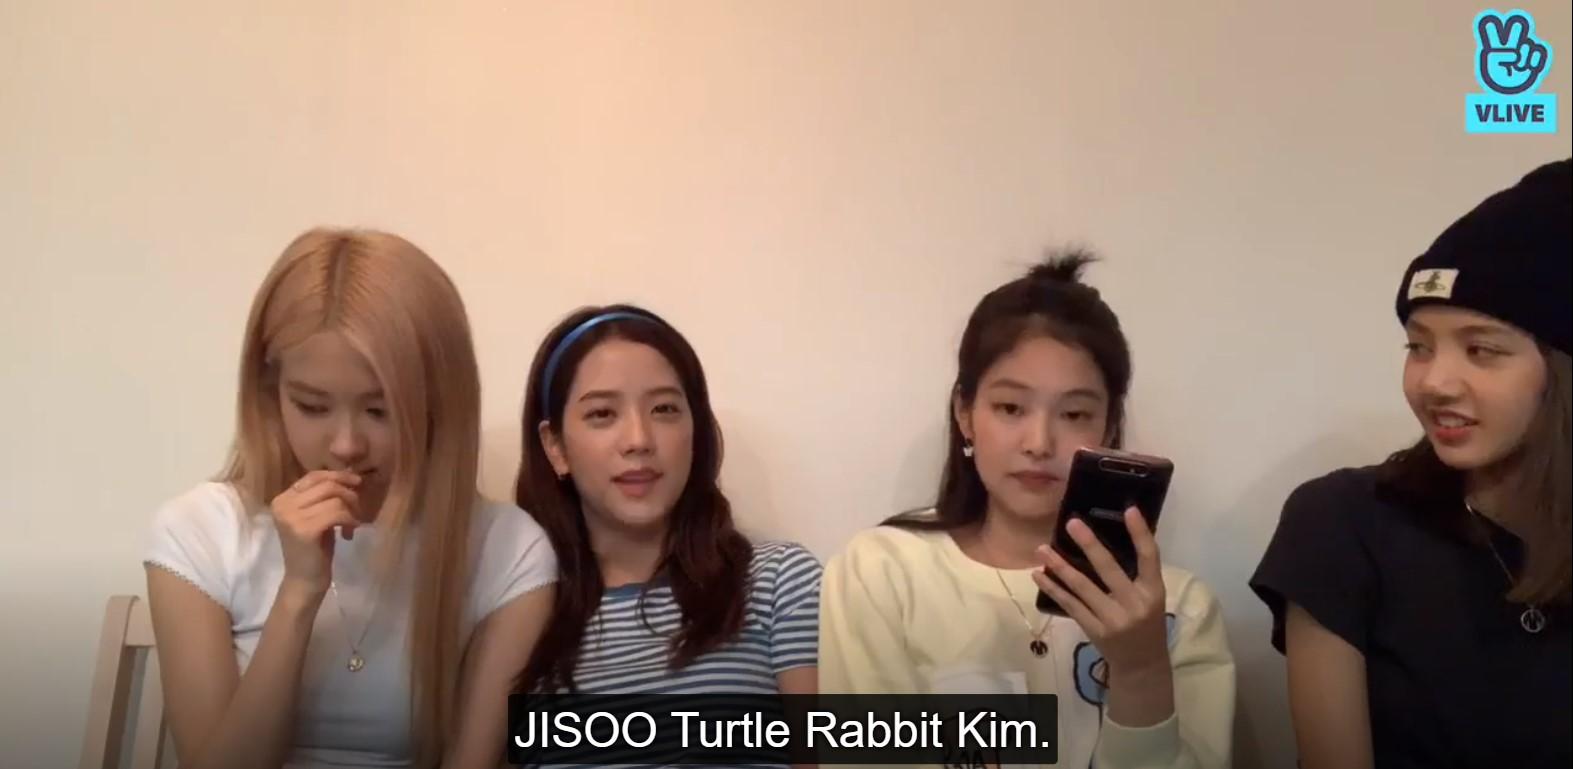 jisoo turtle rabbit kim